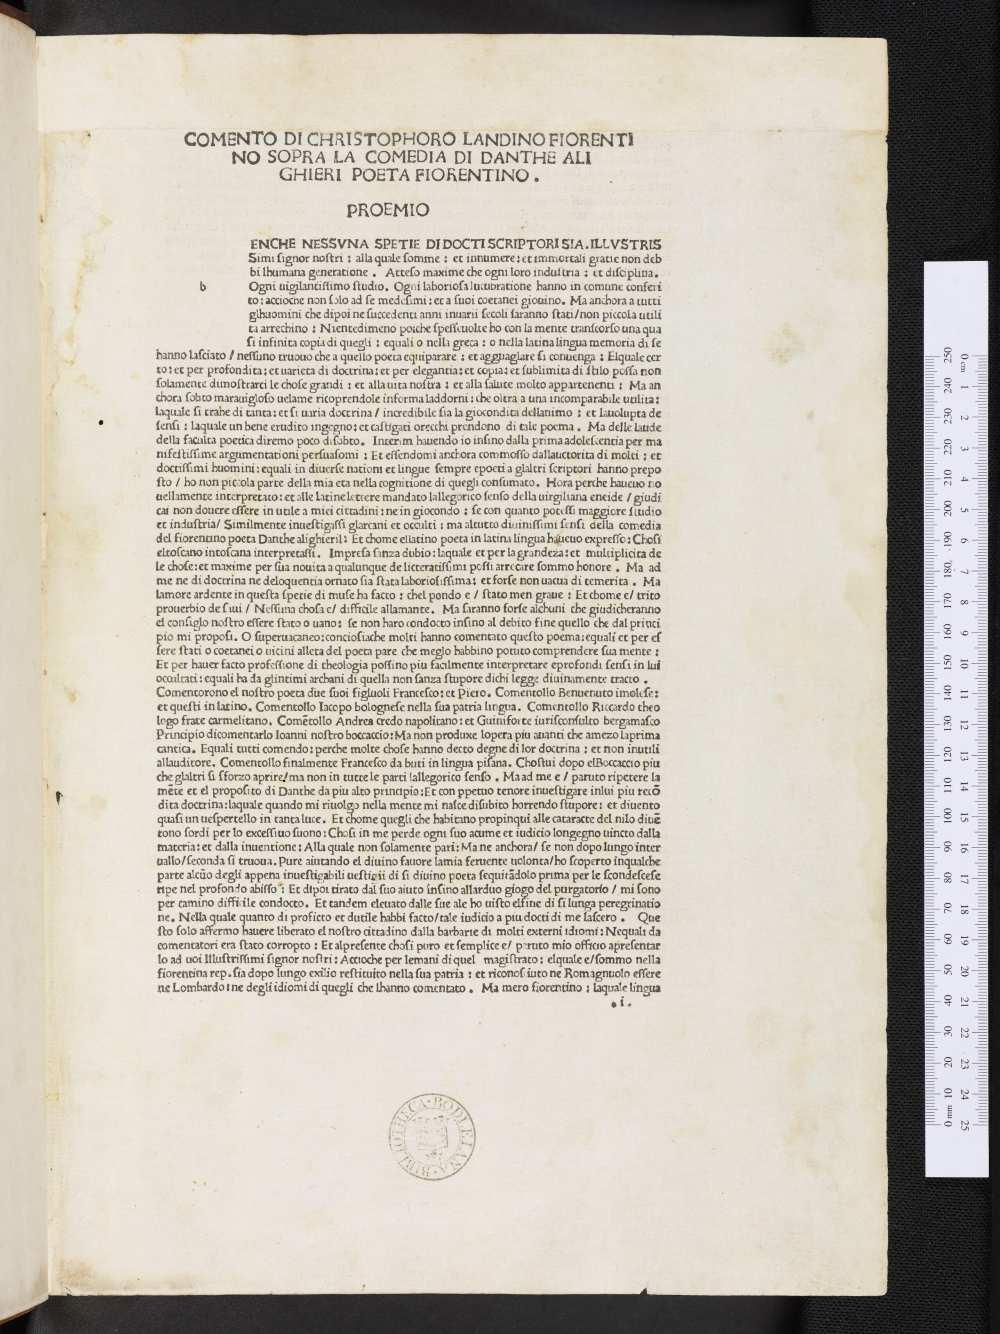 Bodleian Library Auct. 2Q 1.11. A kép forrása: Bodleian Libraries, University of Oxford https://digital.bodleian.ox.ac.uk/objects/1ba80701-8b5b-4fc9-9252-b6101c99e791/surfaces/433b0cad-c660-4011-a5bc-9654825ad8fe/